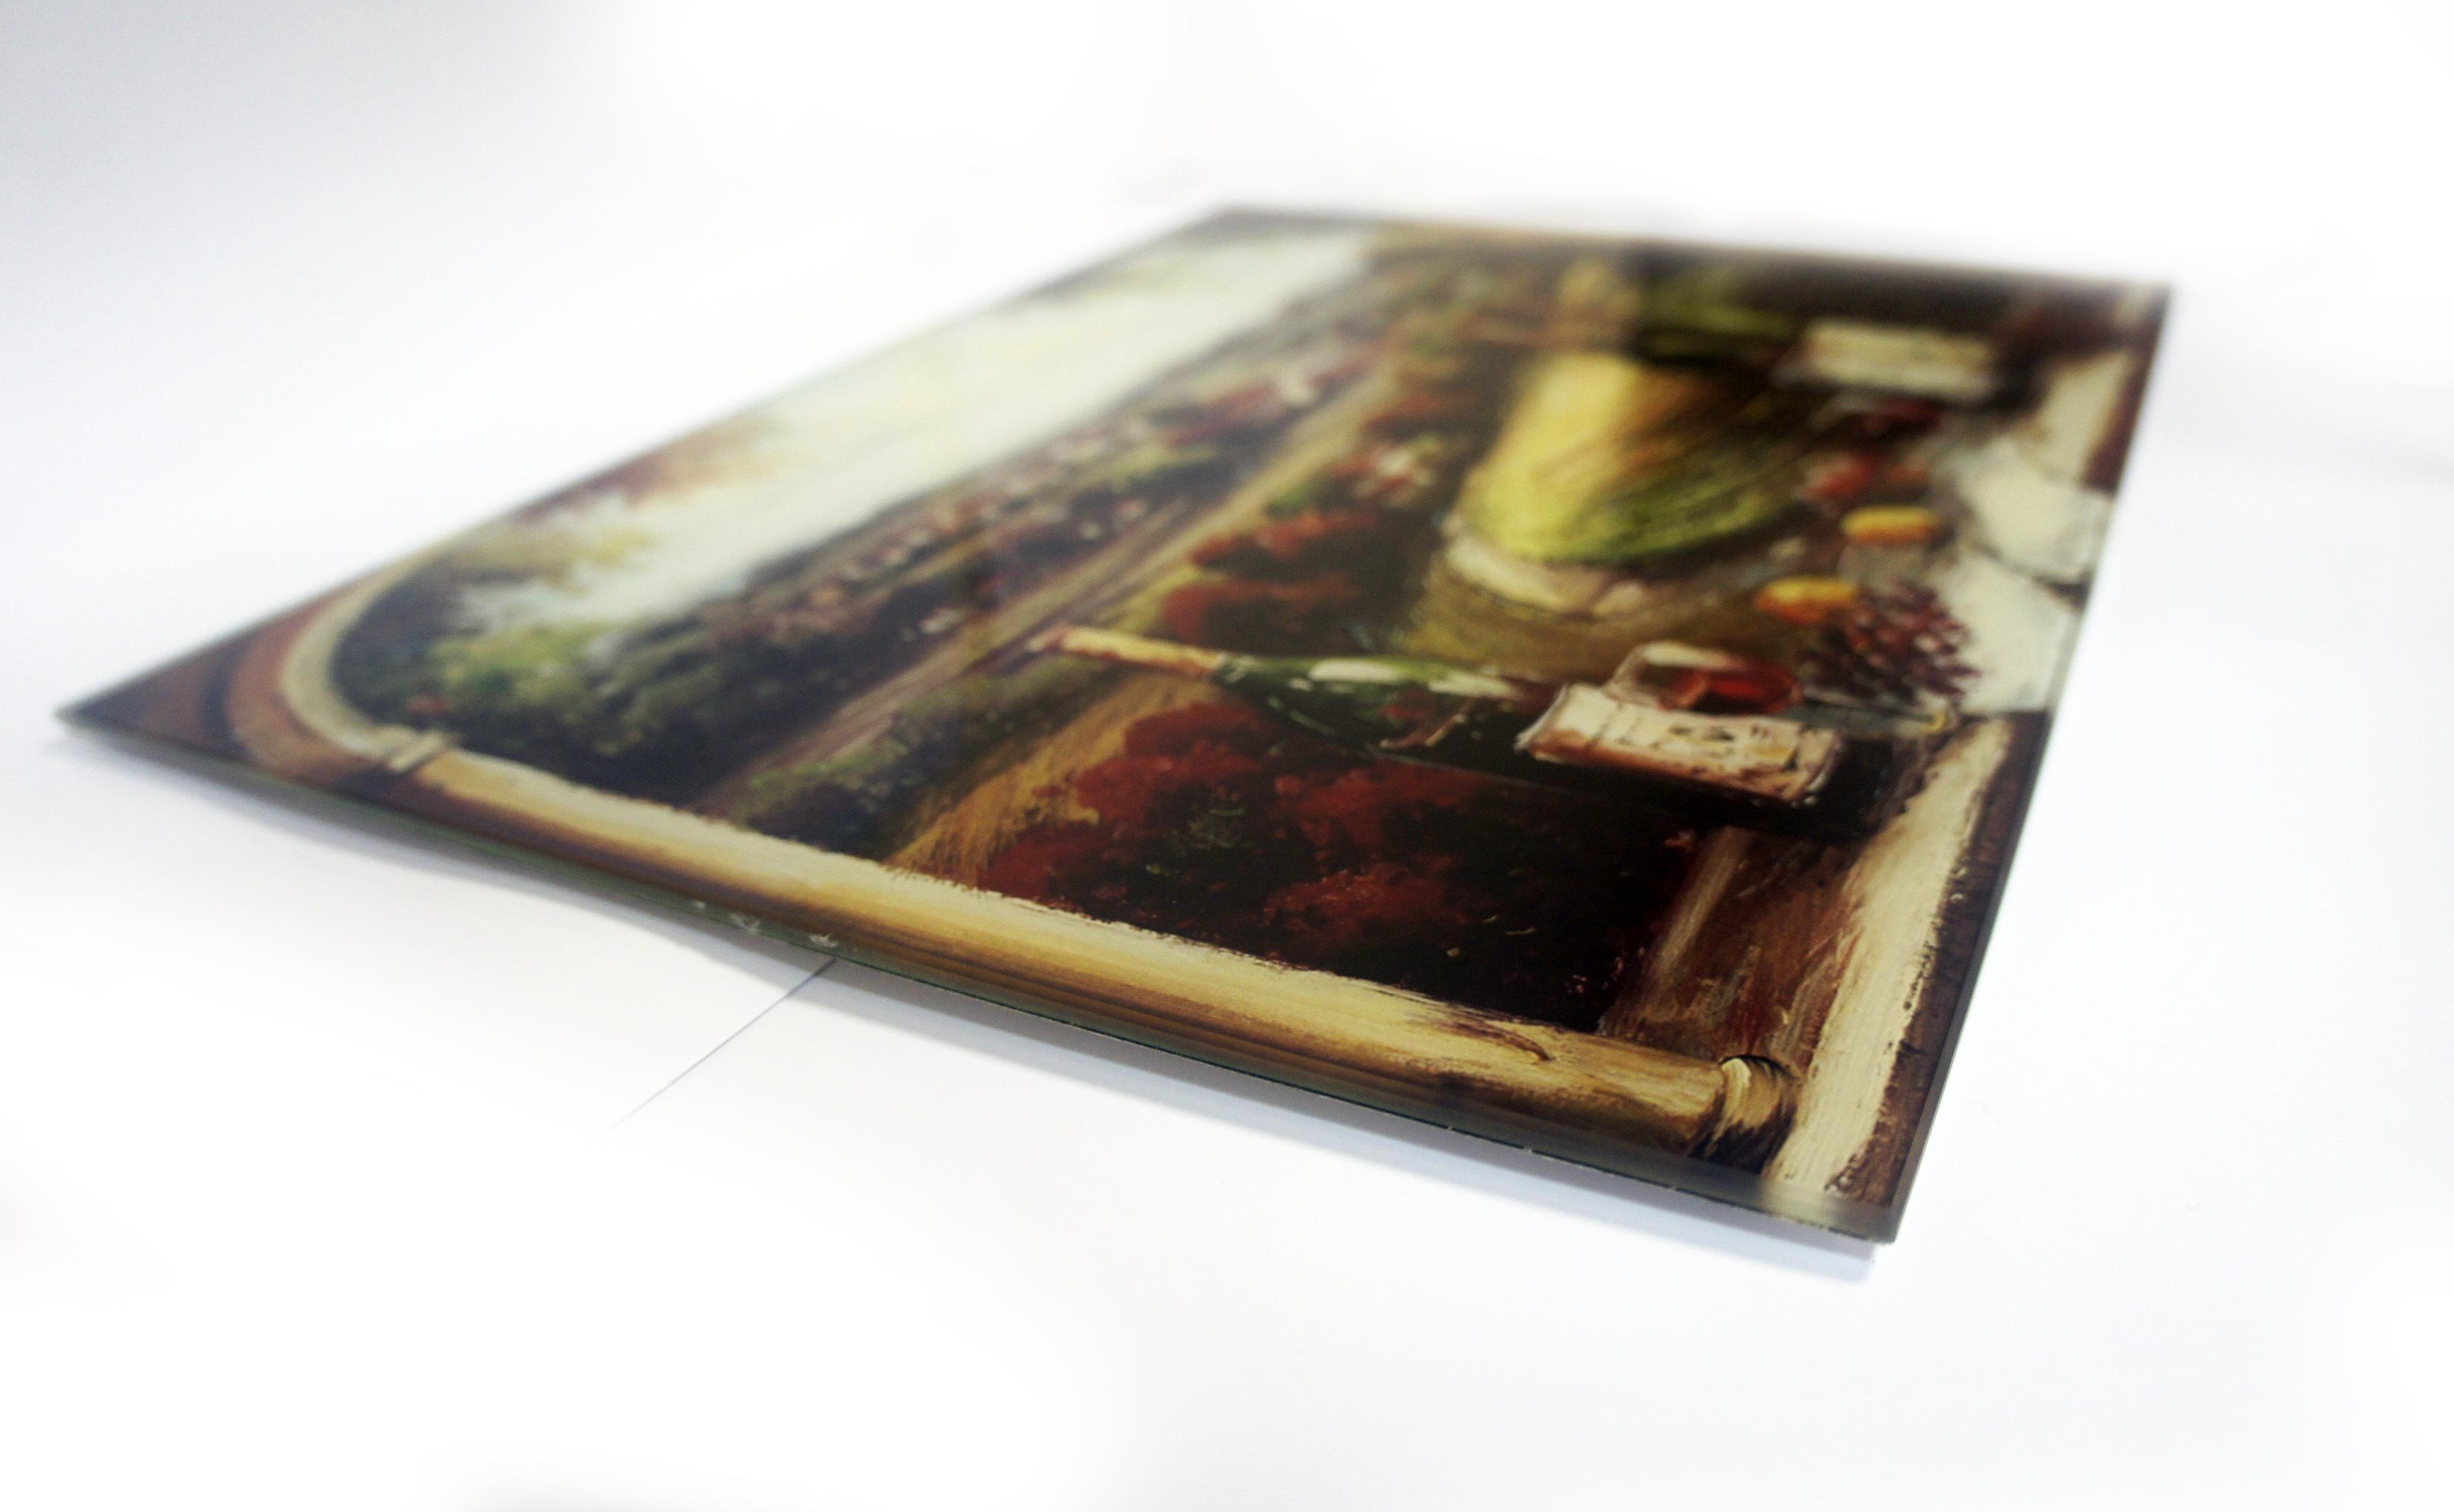 фотокартина на стекле 40х28 см